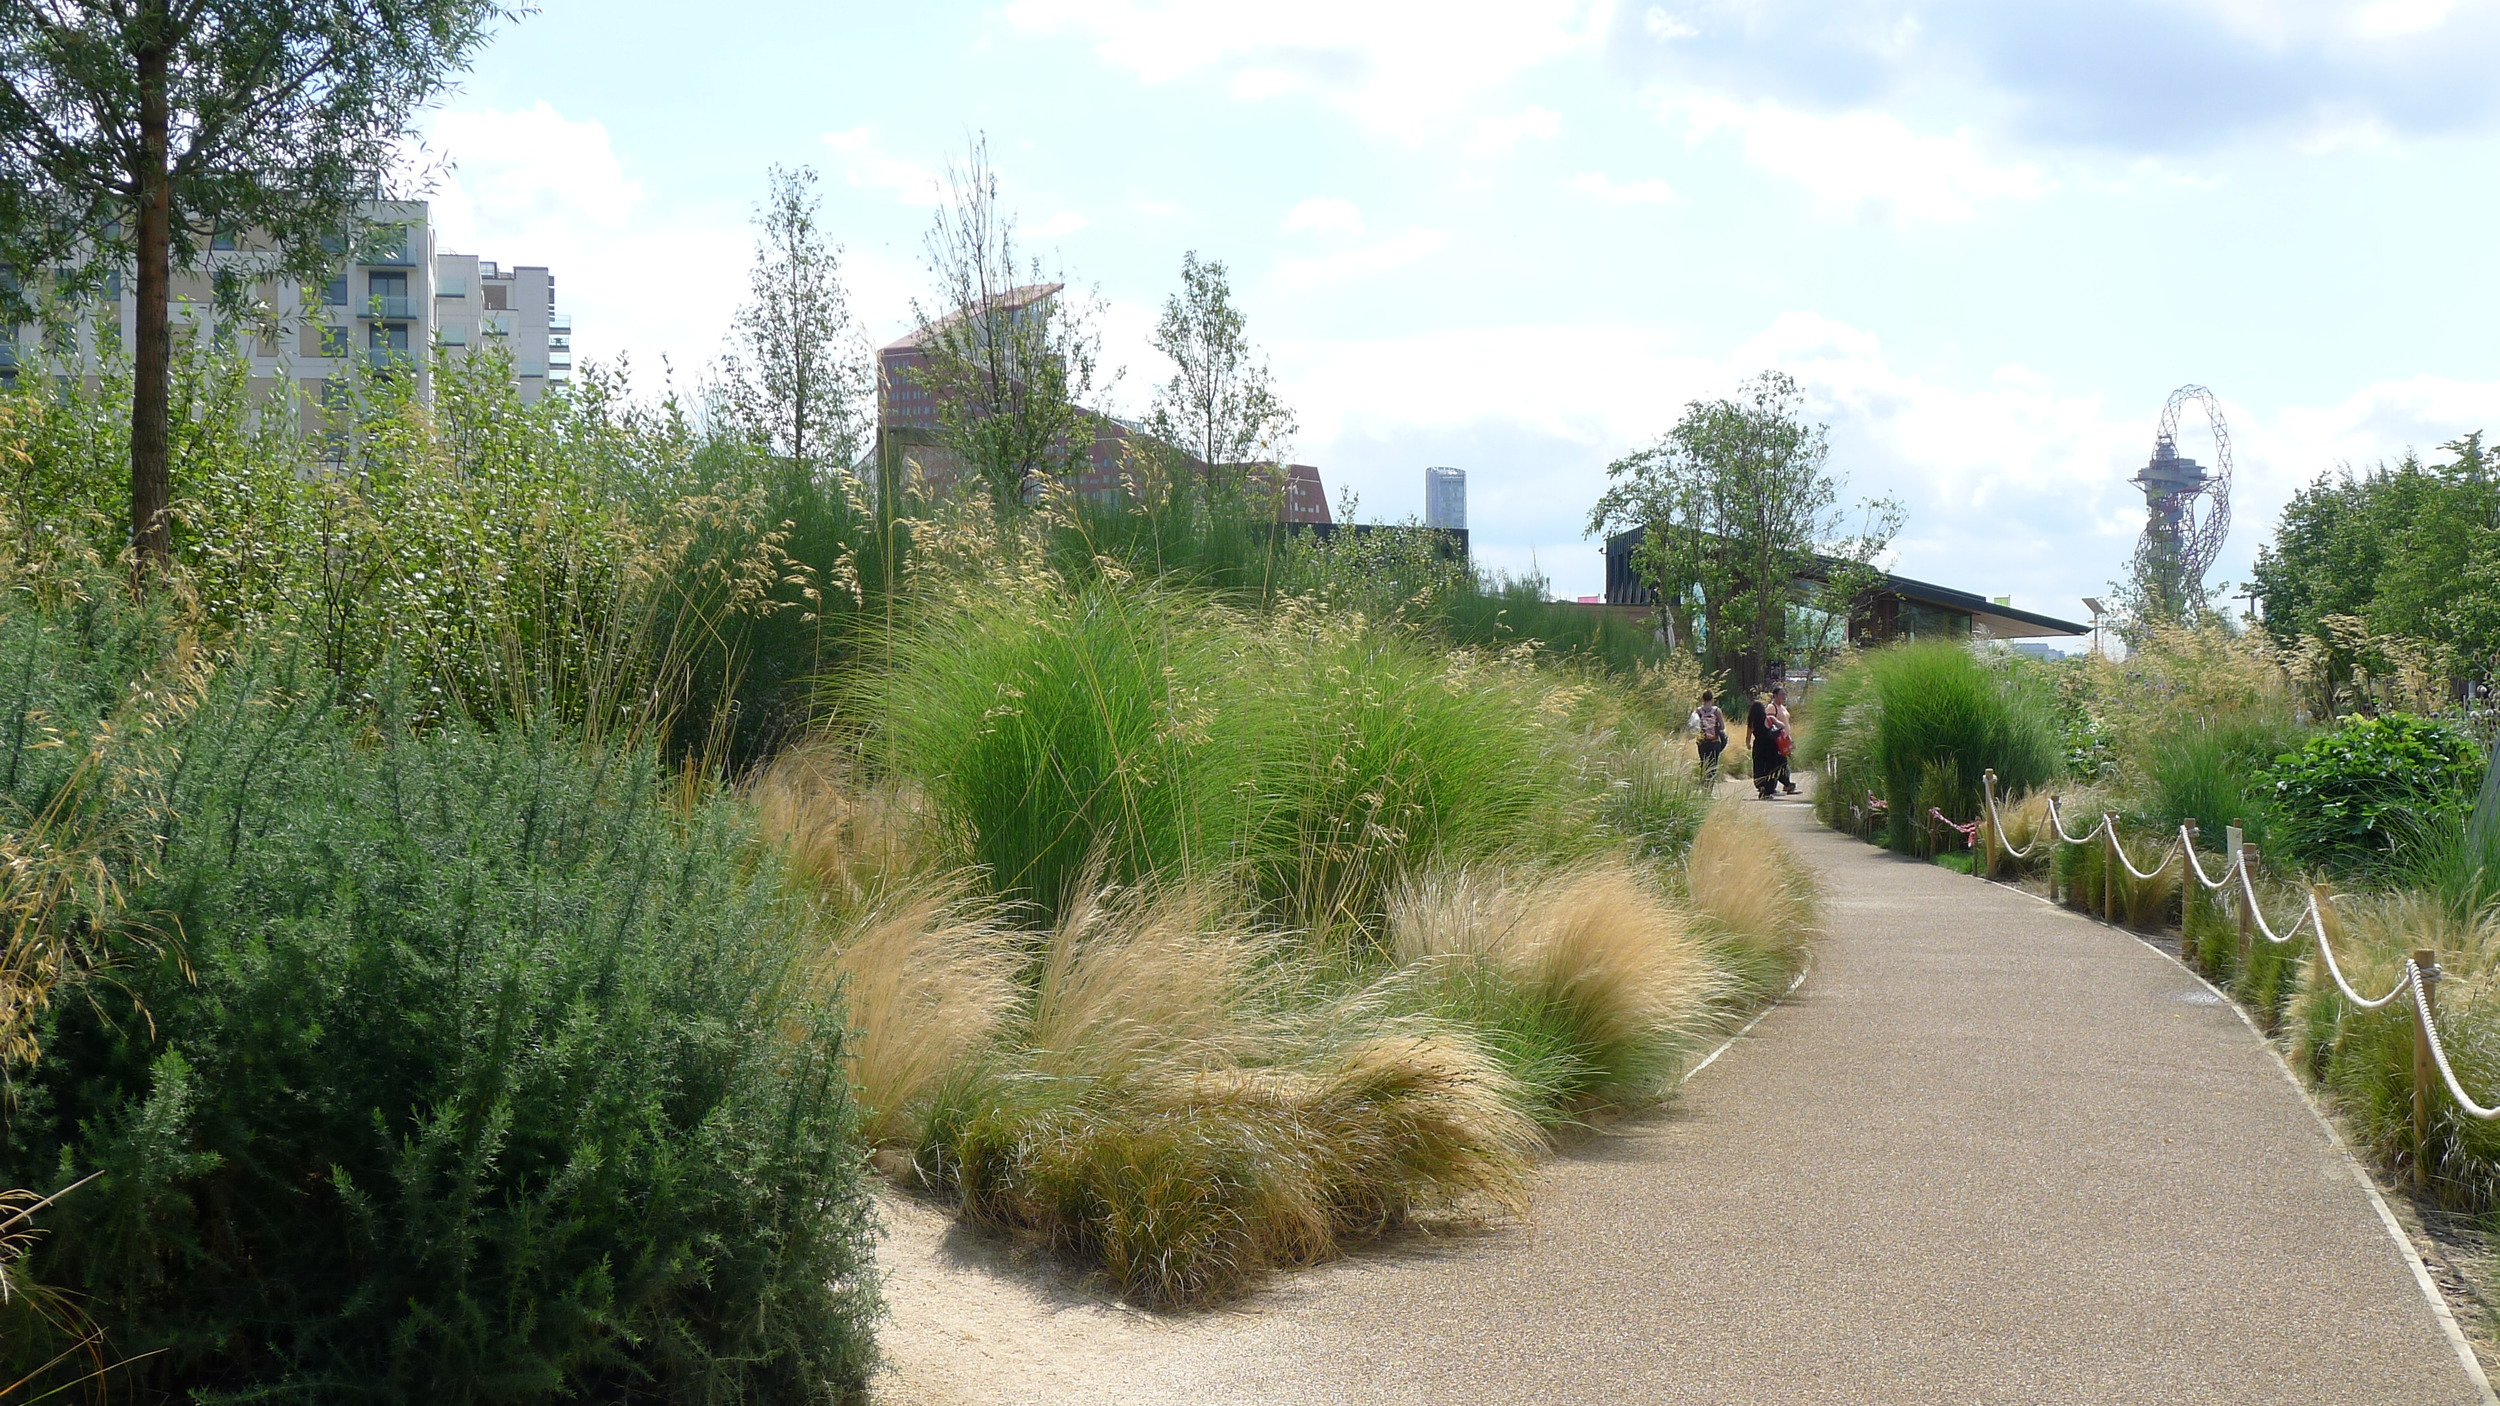 Copy of Queen Elizabeth Olympic Park